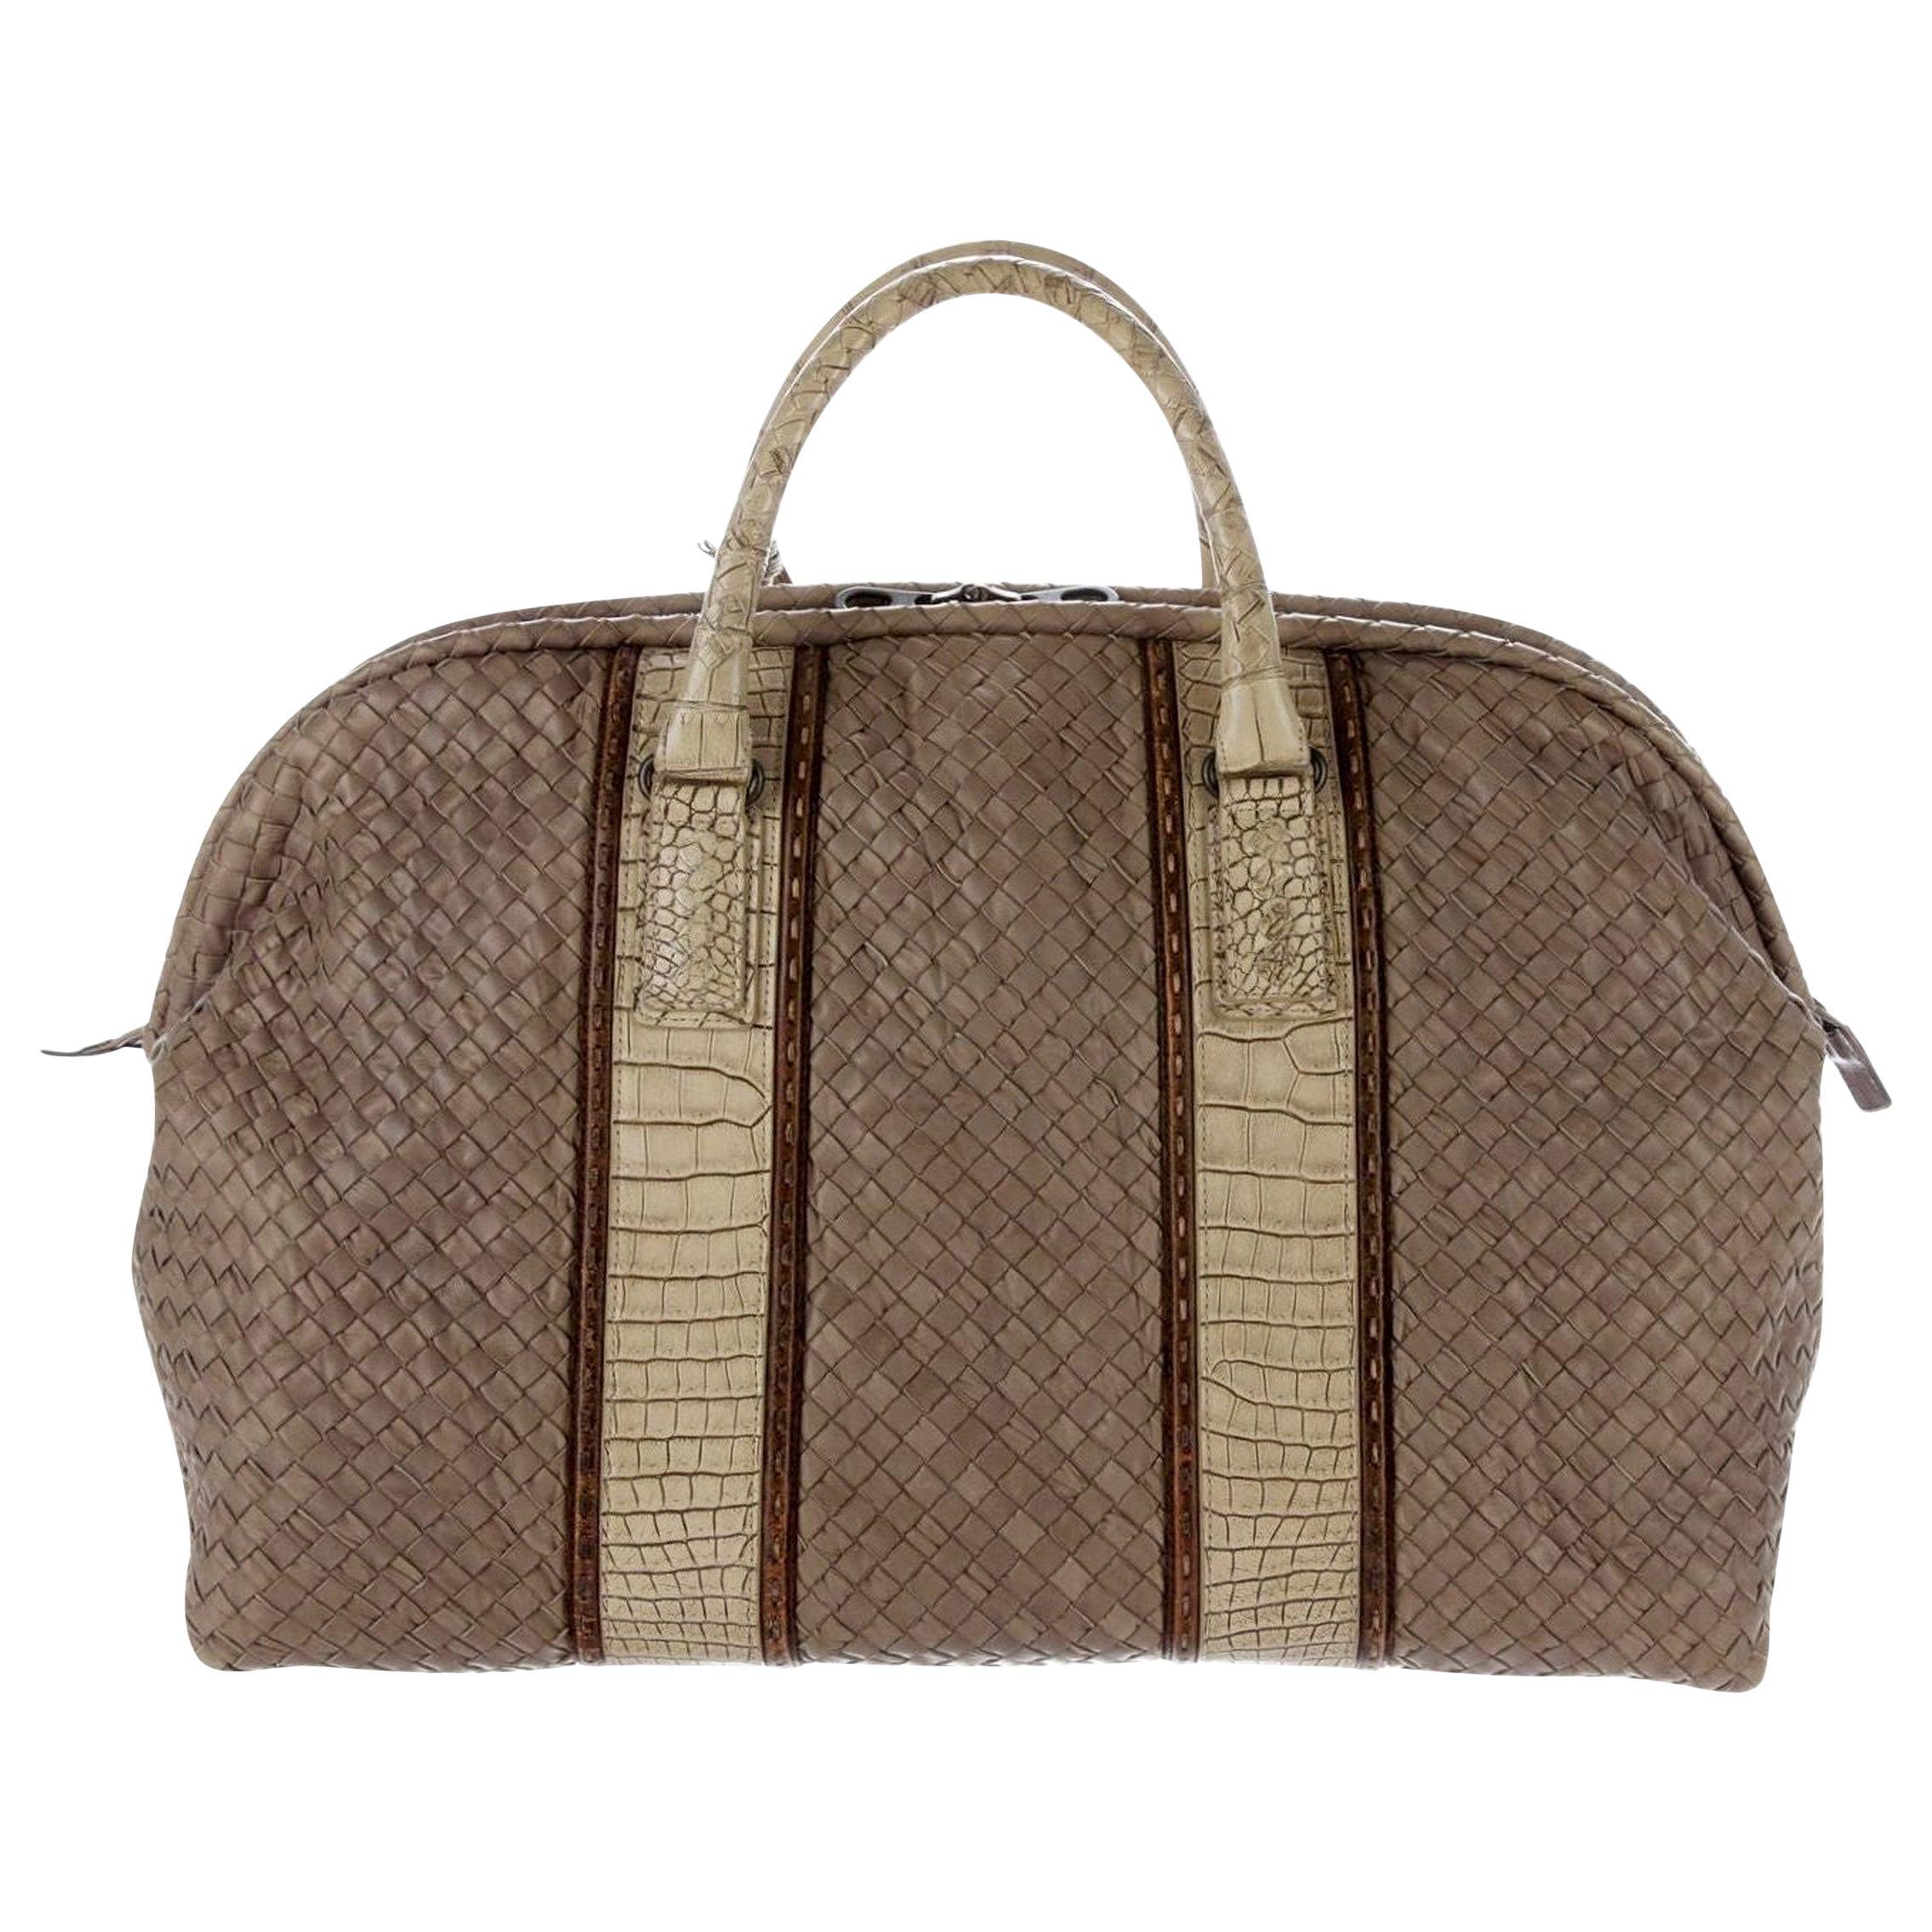 Exotic Bottega Veneta Intrecciato & Crocodile Weekender Travel Bag